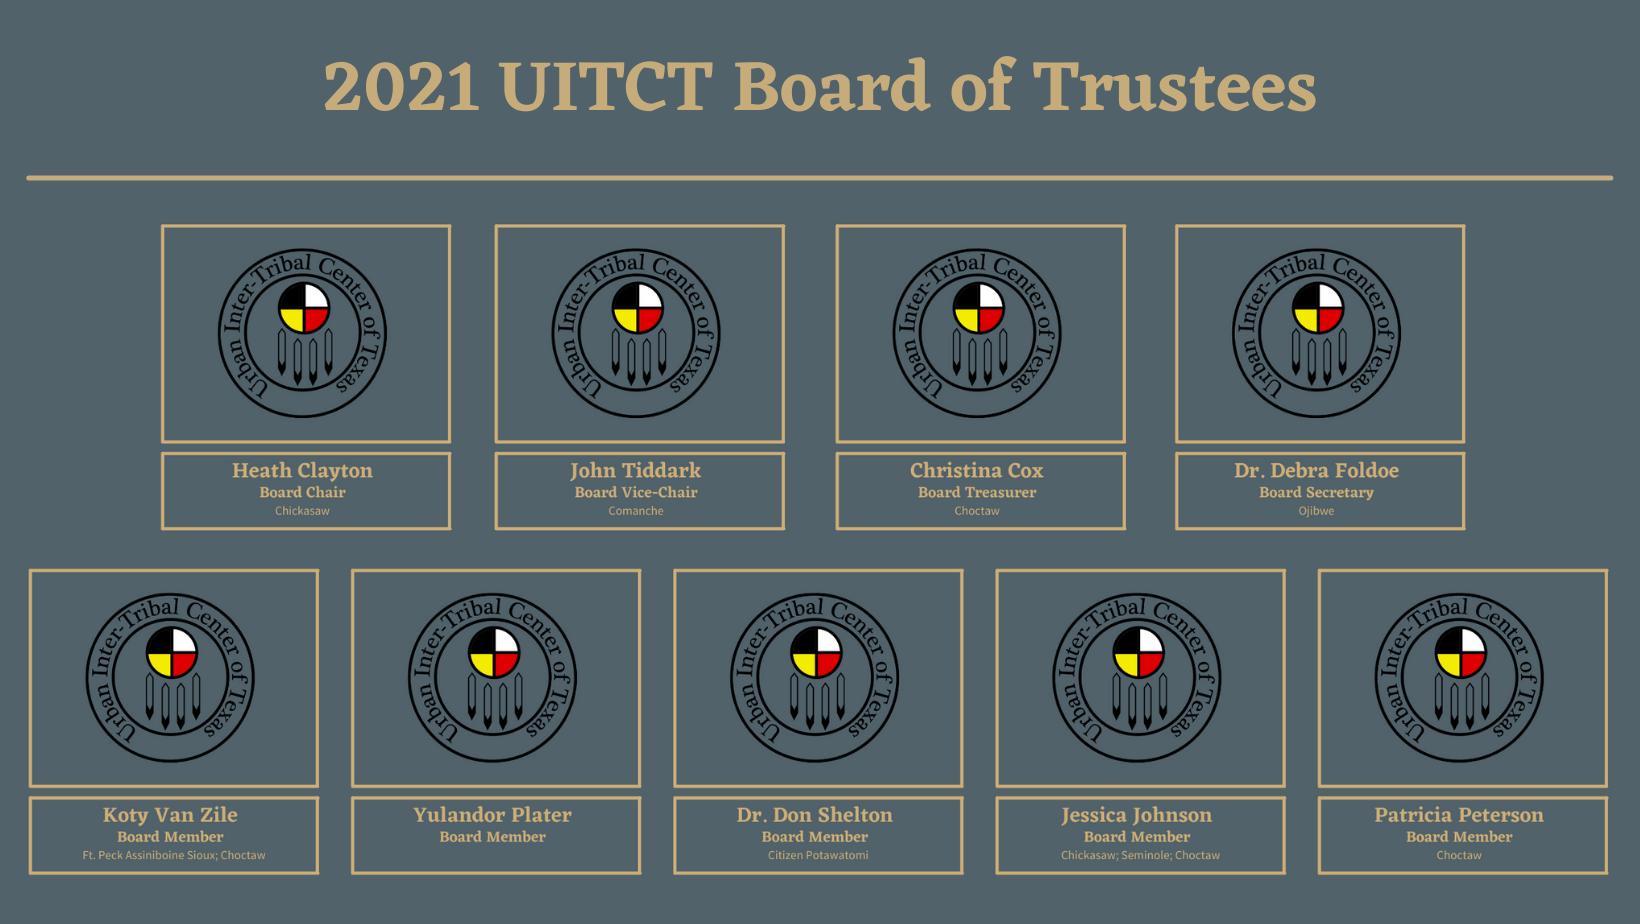 2021 UITCT Board of Trustees